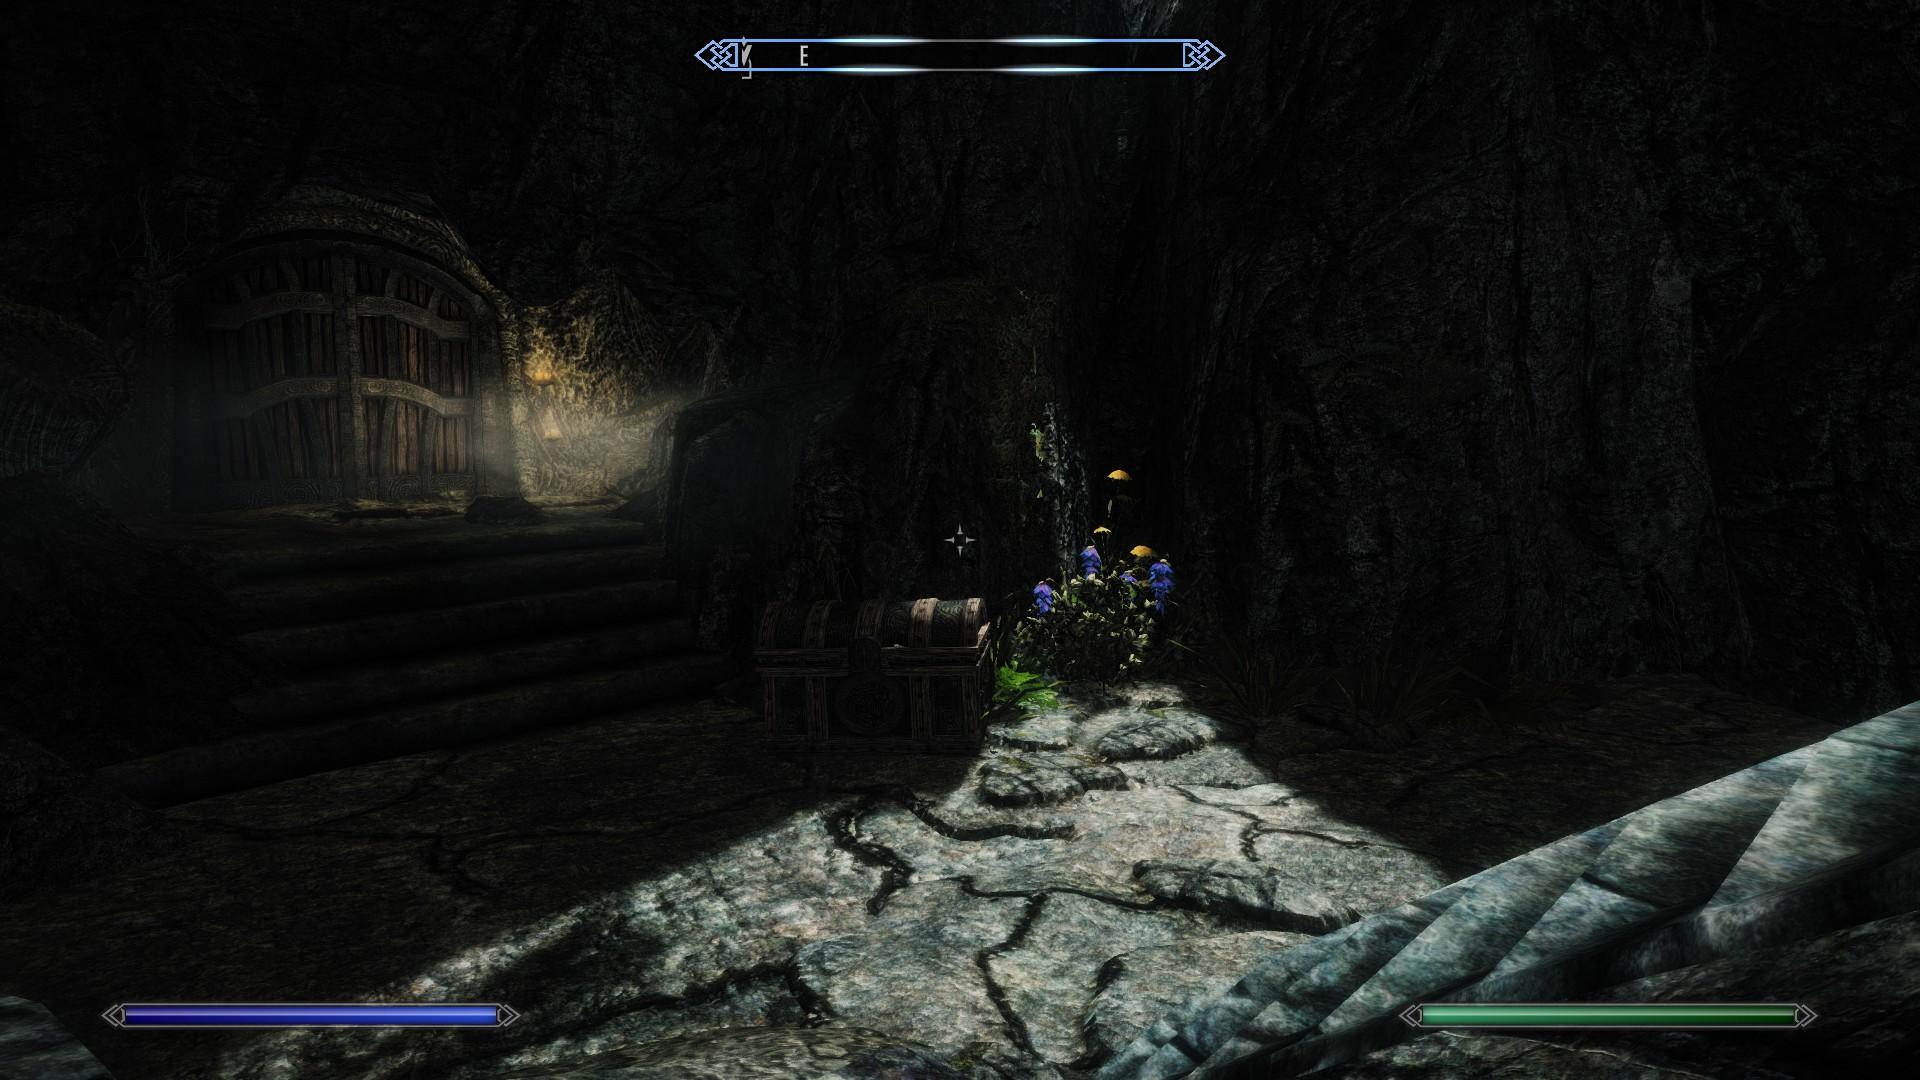 20180211152829_1.jpg - Elder Scrolls 5: Skyrim, the